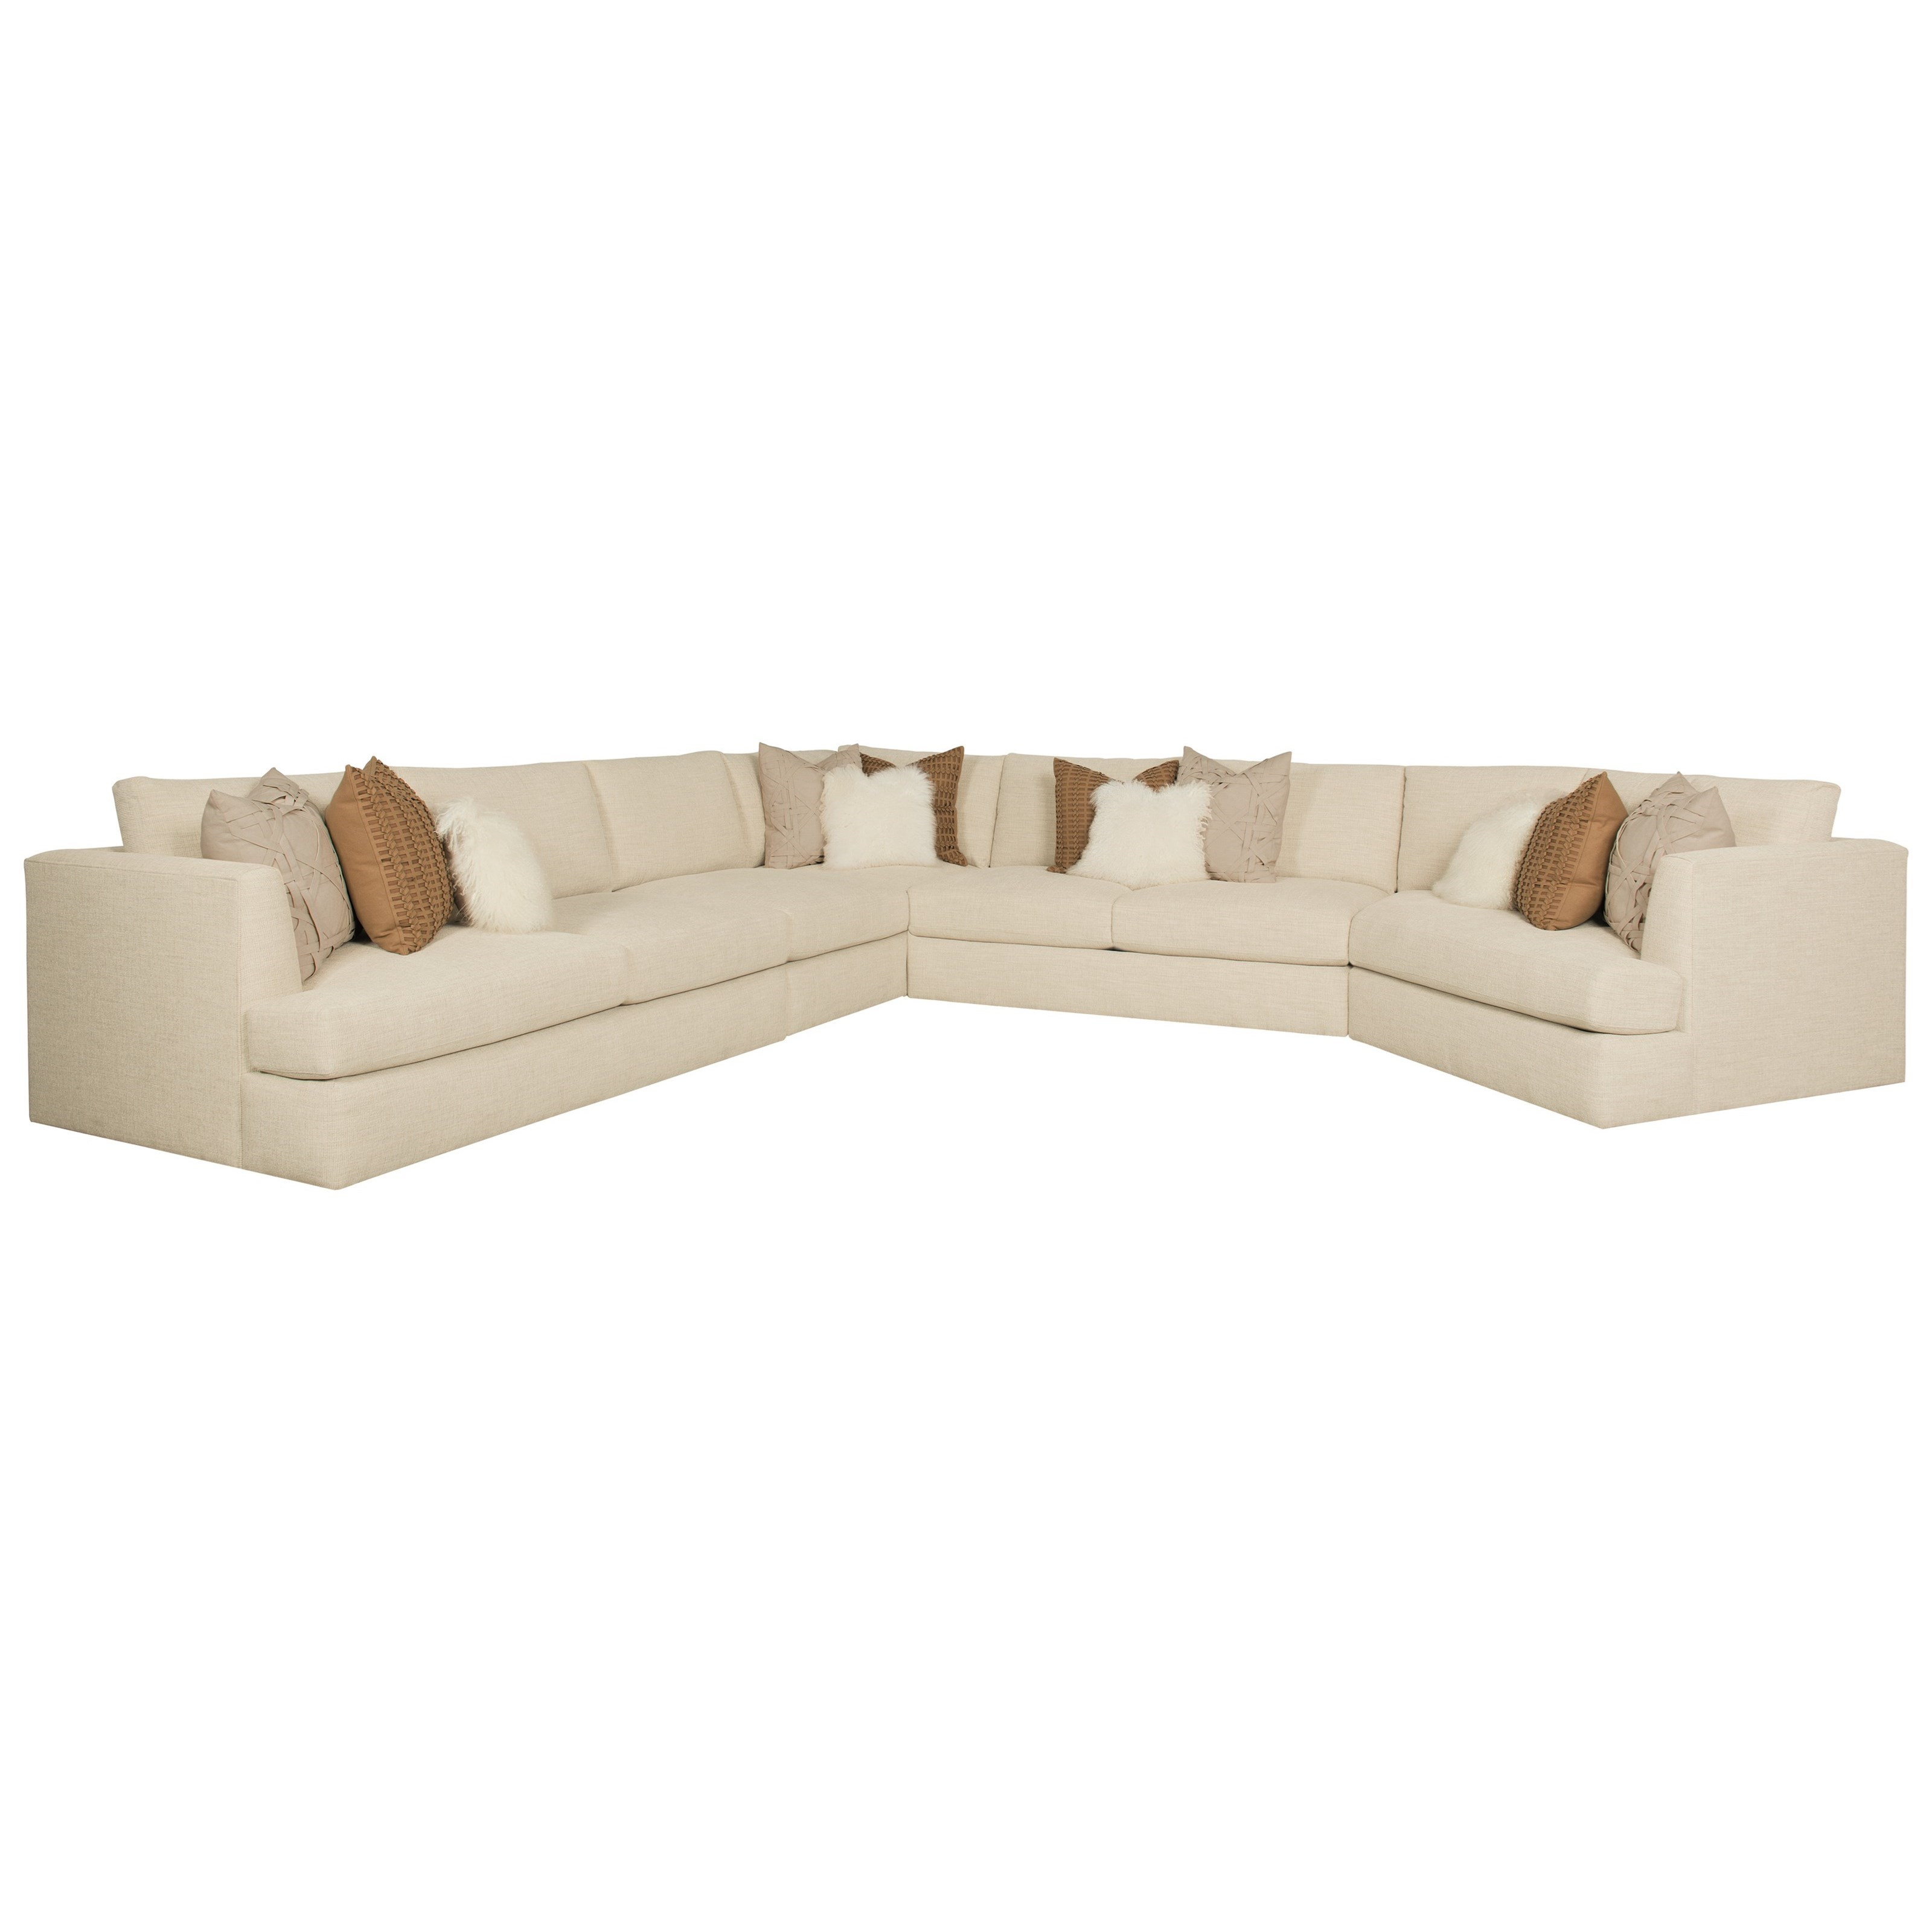 Bernhardt Sydney Seven Seat Sectional Sofa Jacksonville